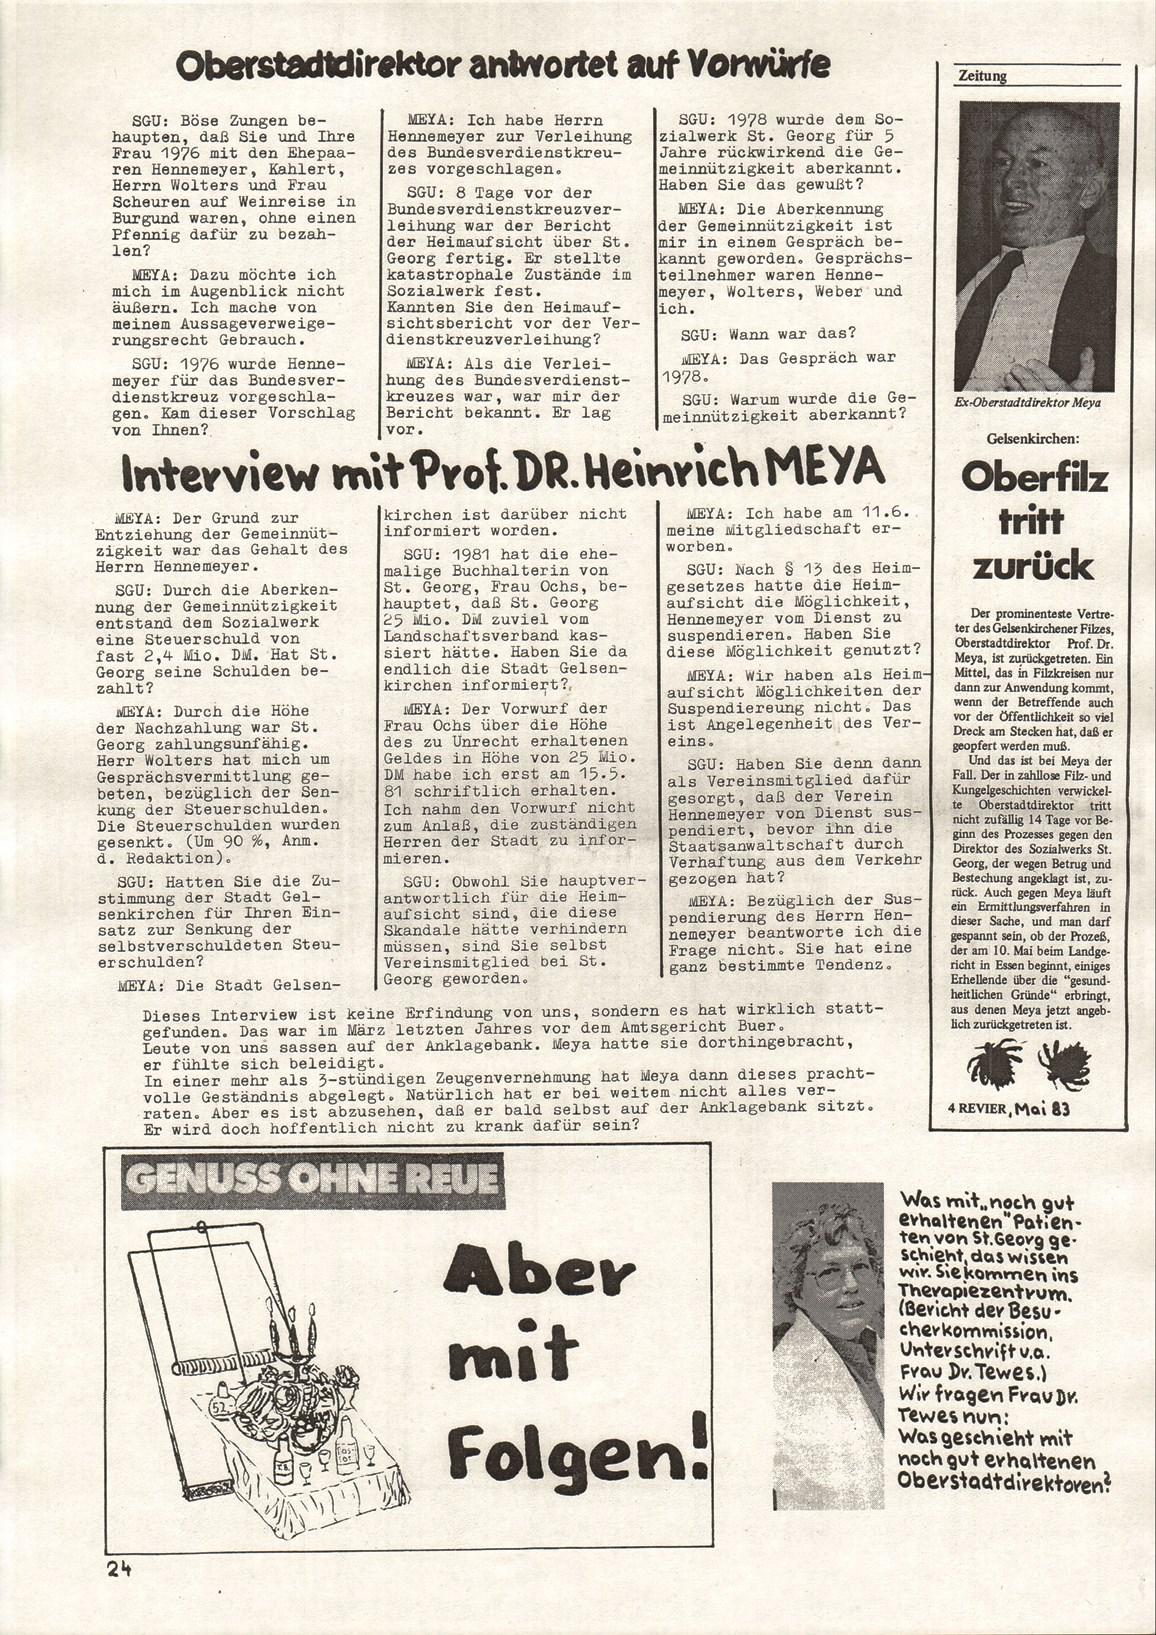 Gelsenkirchen_Selbsthilfe_Blatt_1983_02_24